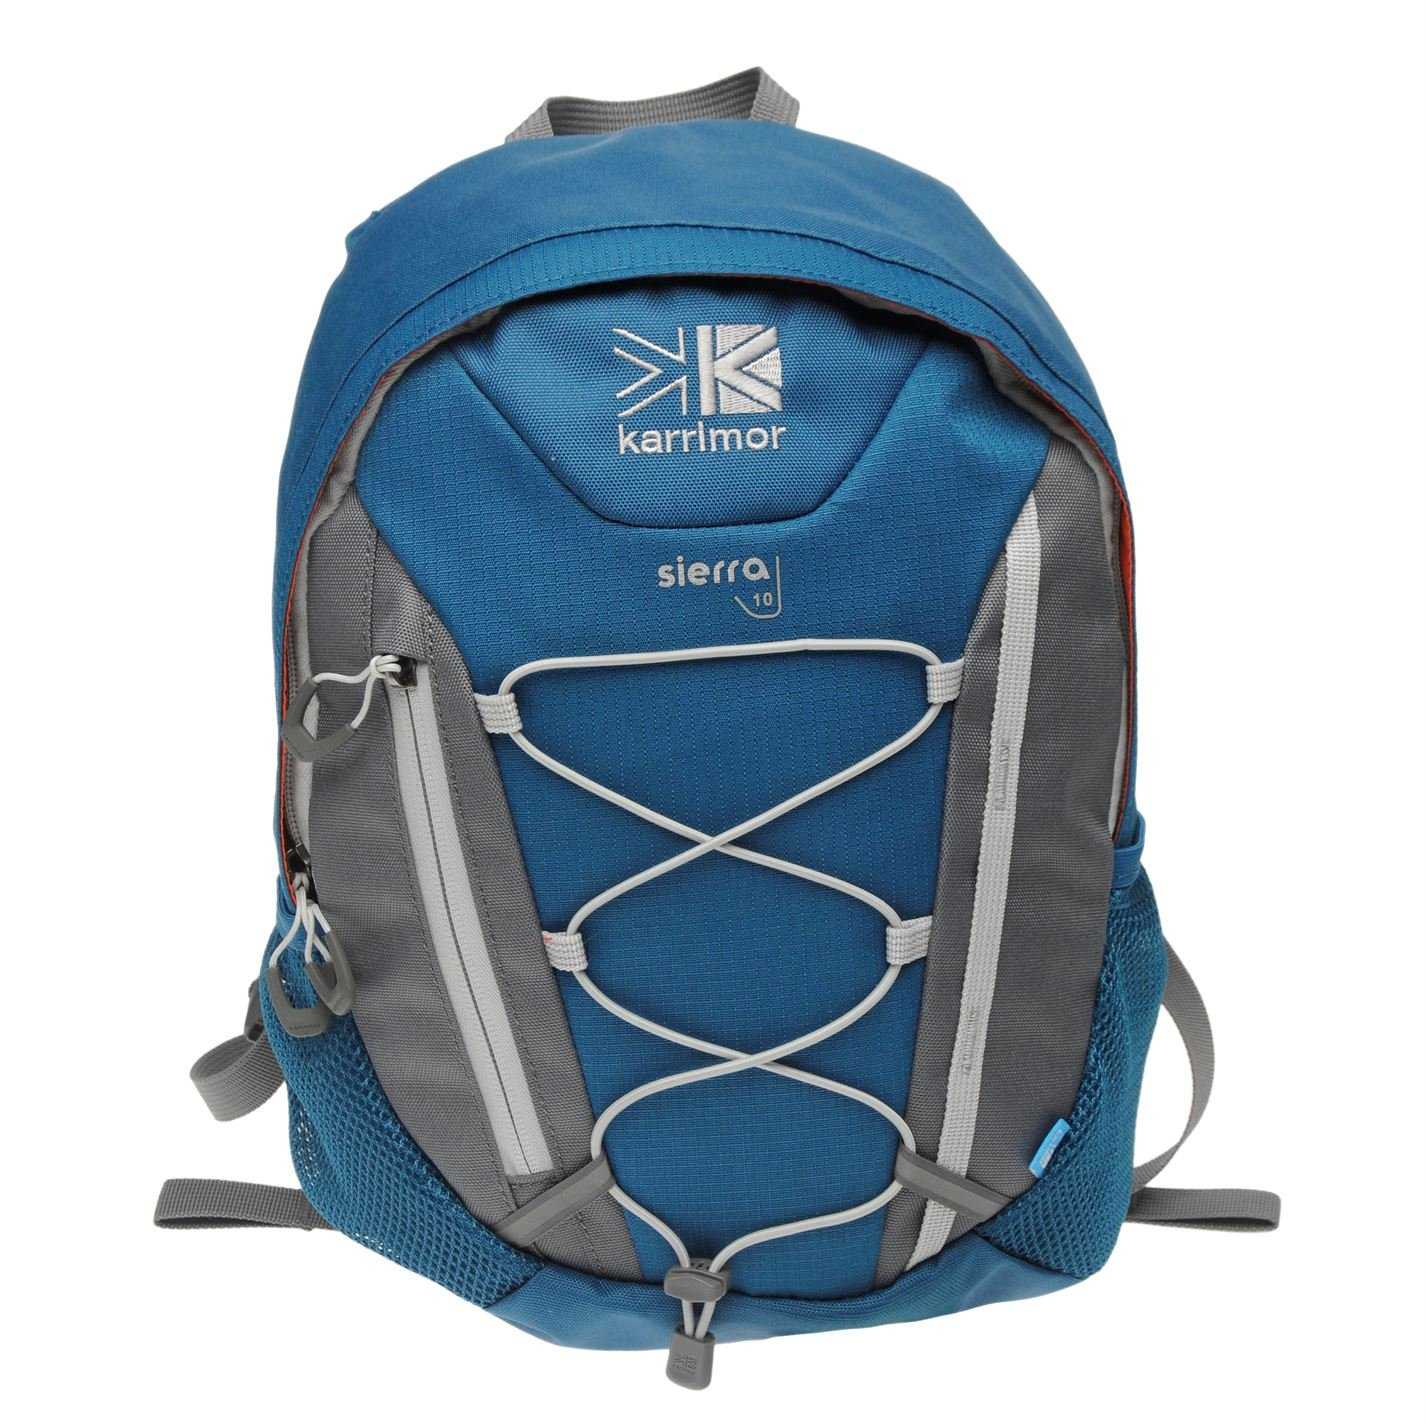 Karrimor Unisex Sierra 10 Mochila Macuto Senderismo Trekking: Amazon.es: Ropa y accesorios